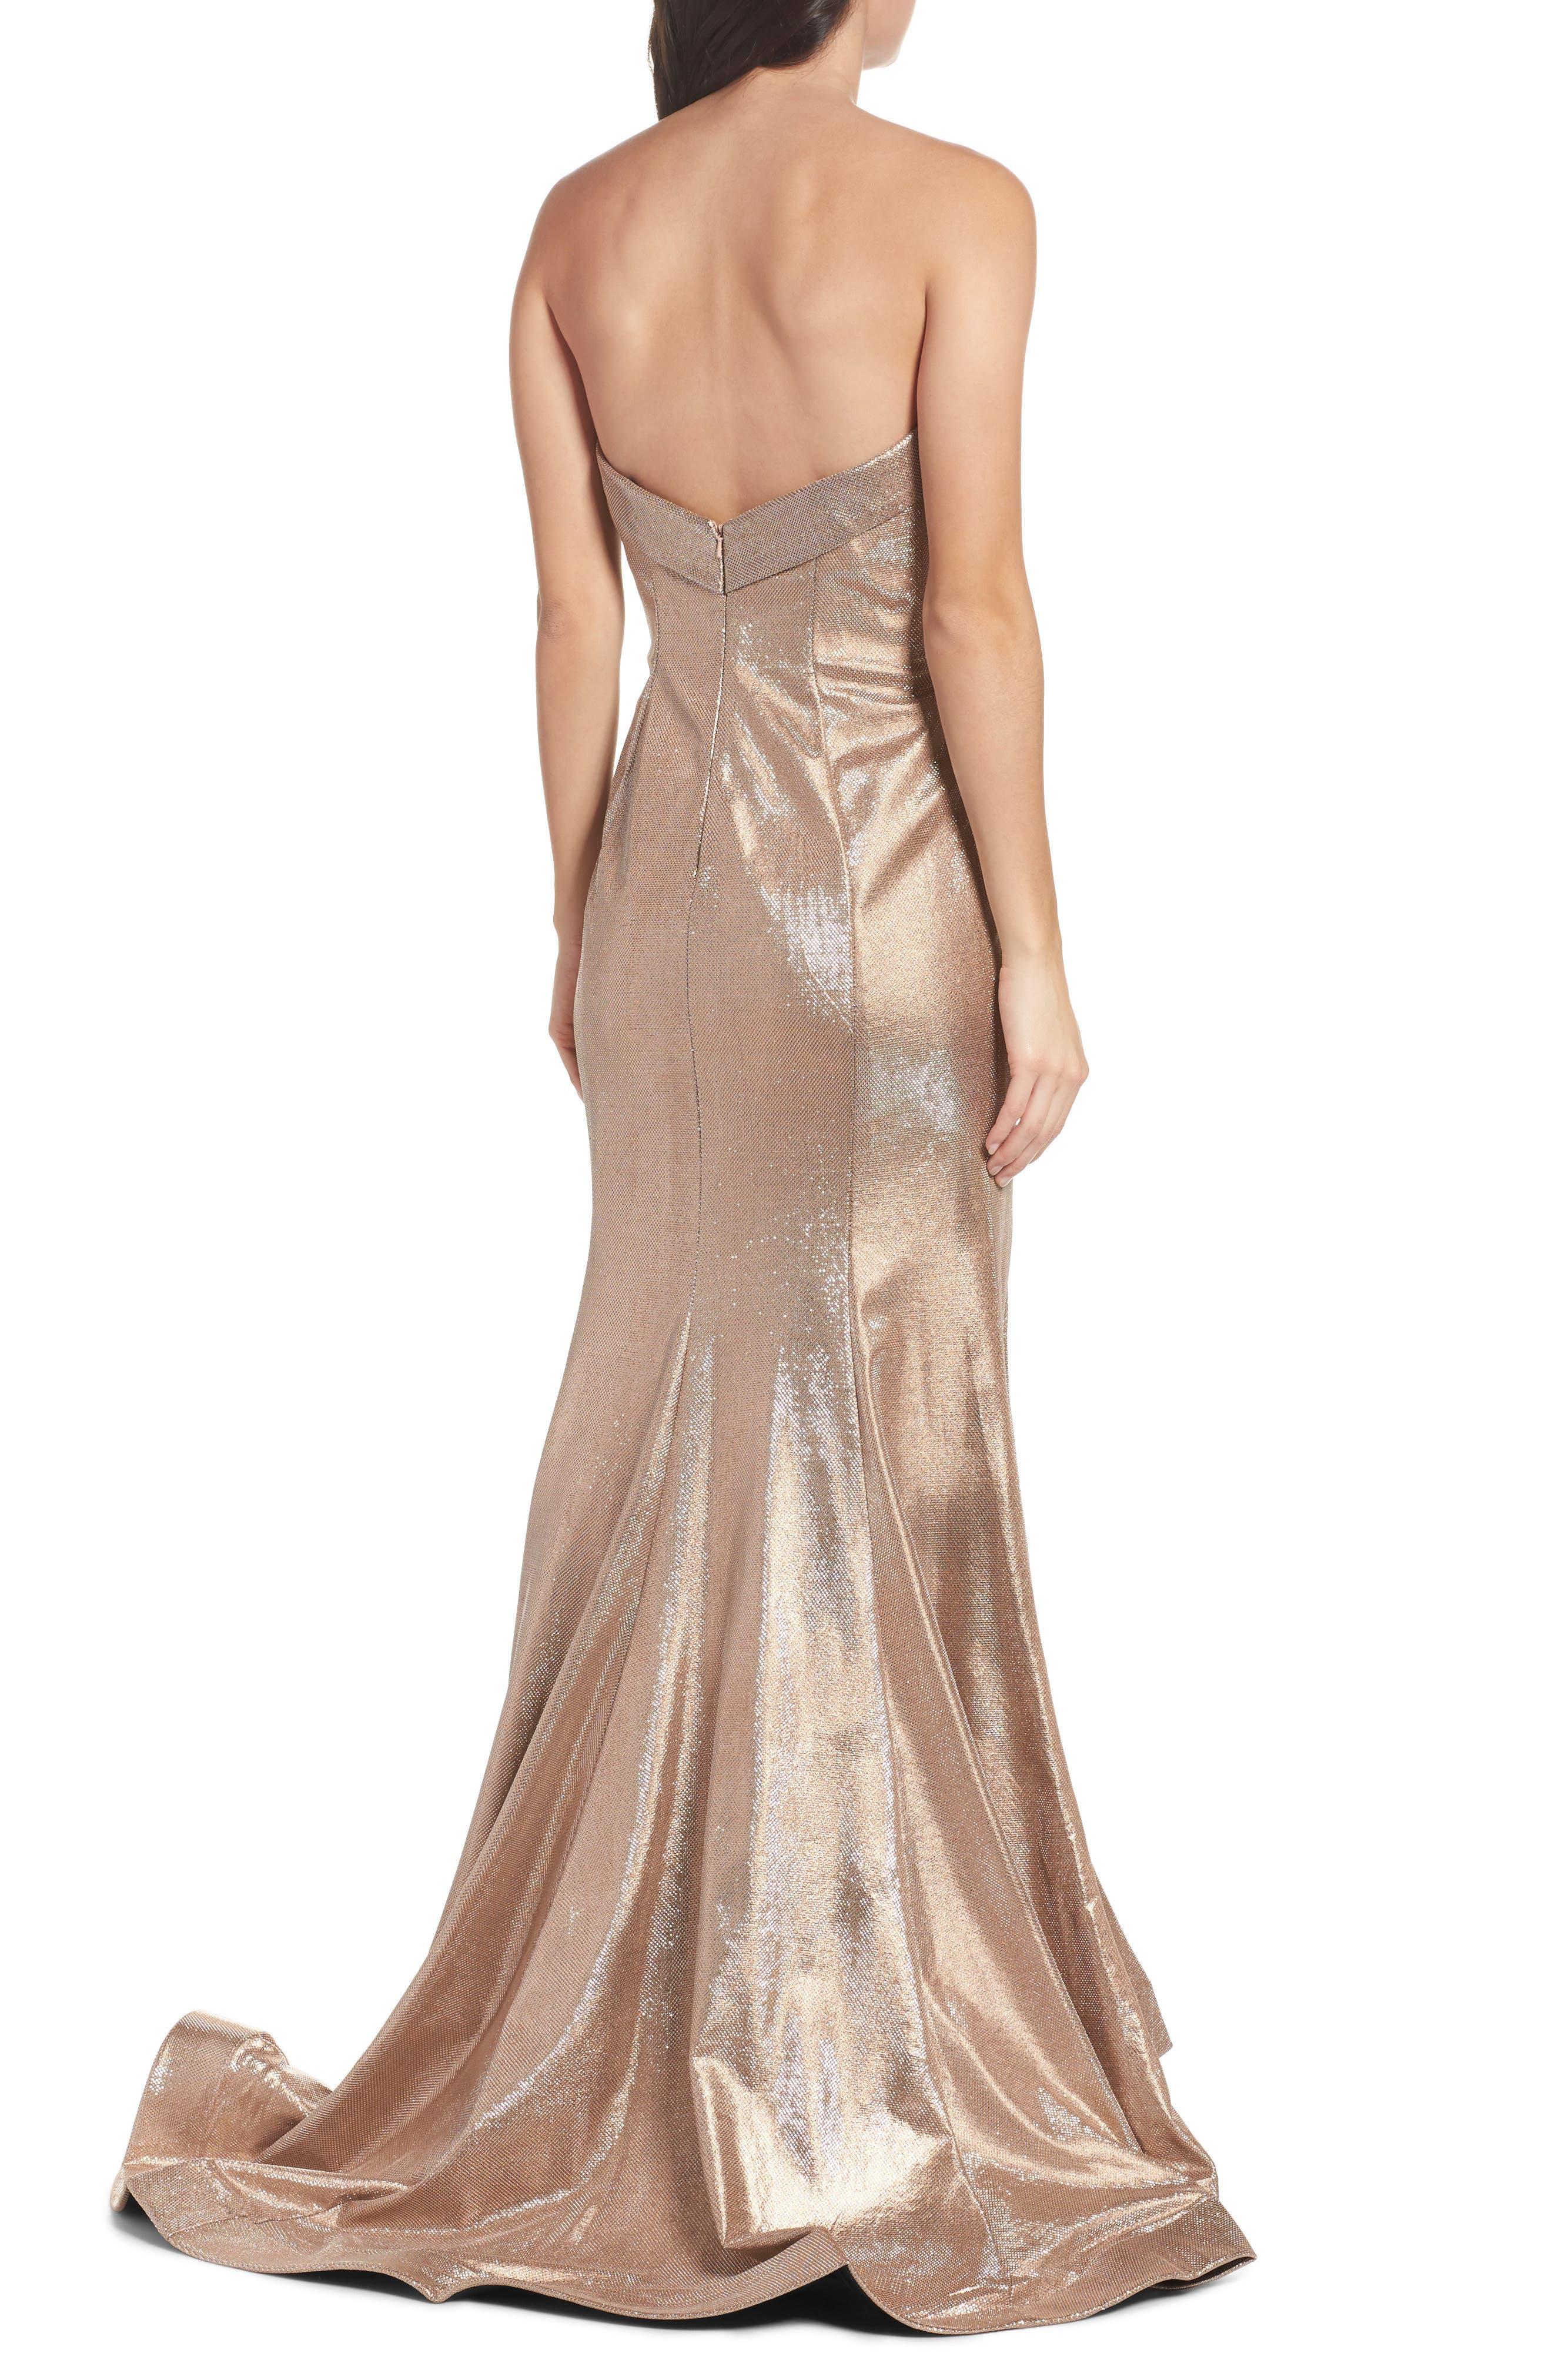 Metallic Mermaid Gown,                             Alternate thumbnail 2, color,                             272